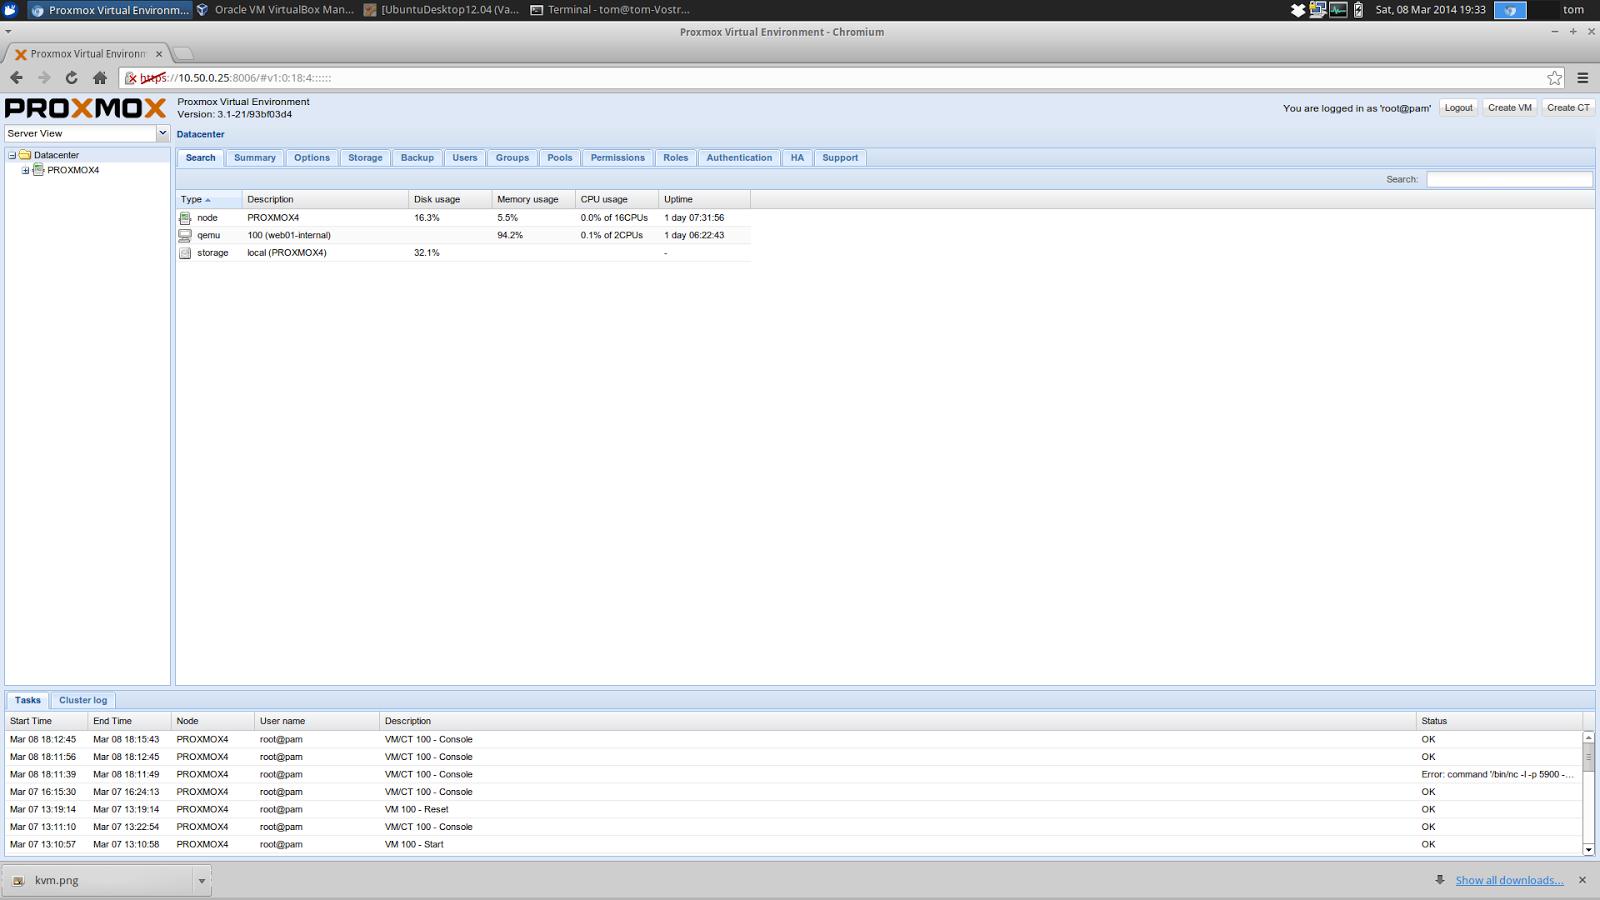 TTB > Toms Tech Blog: KVM/Proxmox   My journey into Open Source